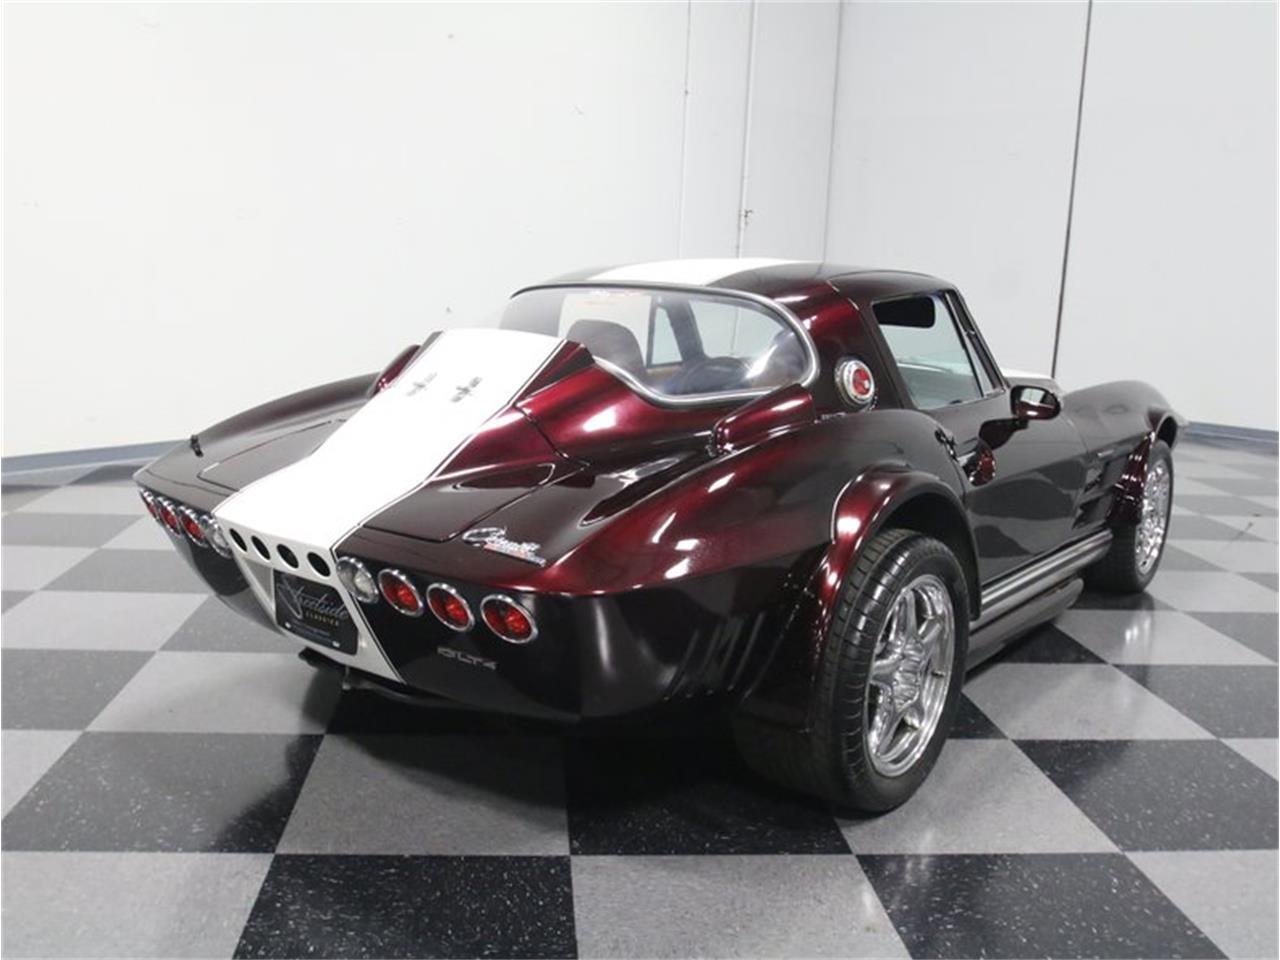 For Sale: 1966 Chevrolet Corvette in Lithia Springs, Georgia